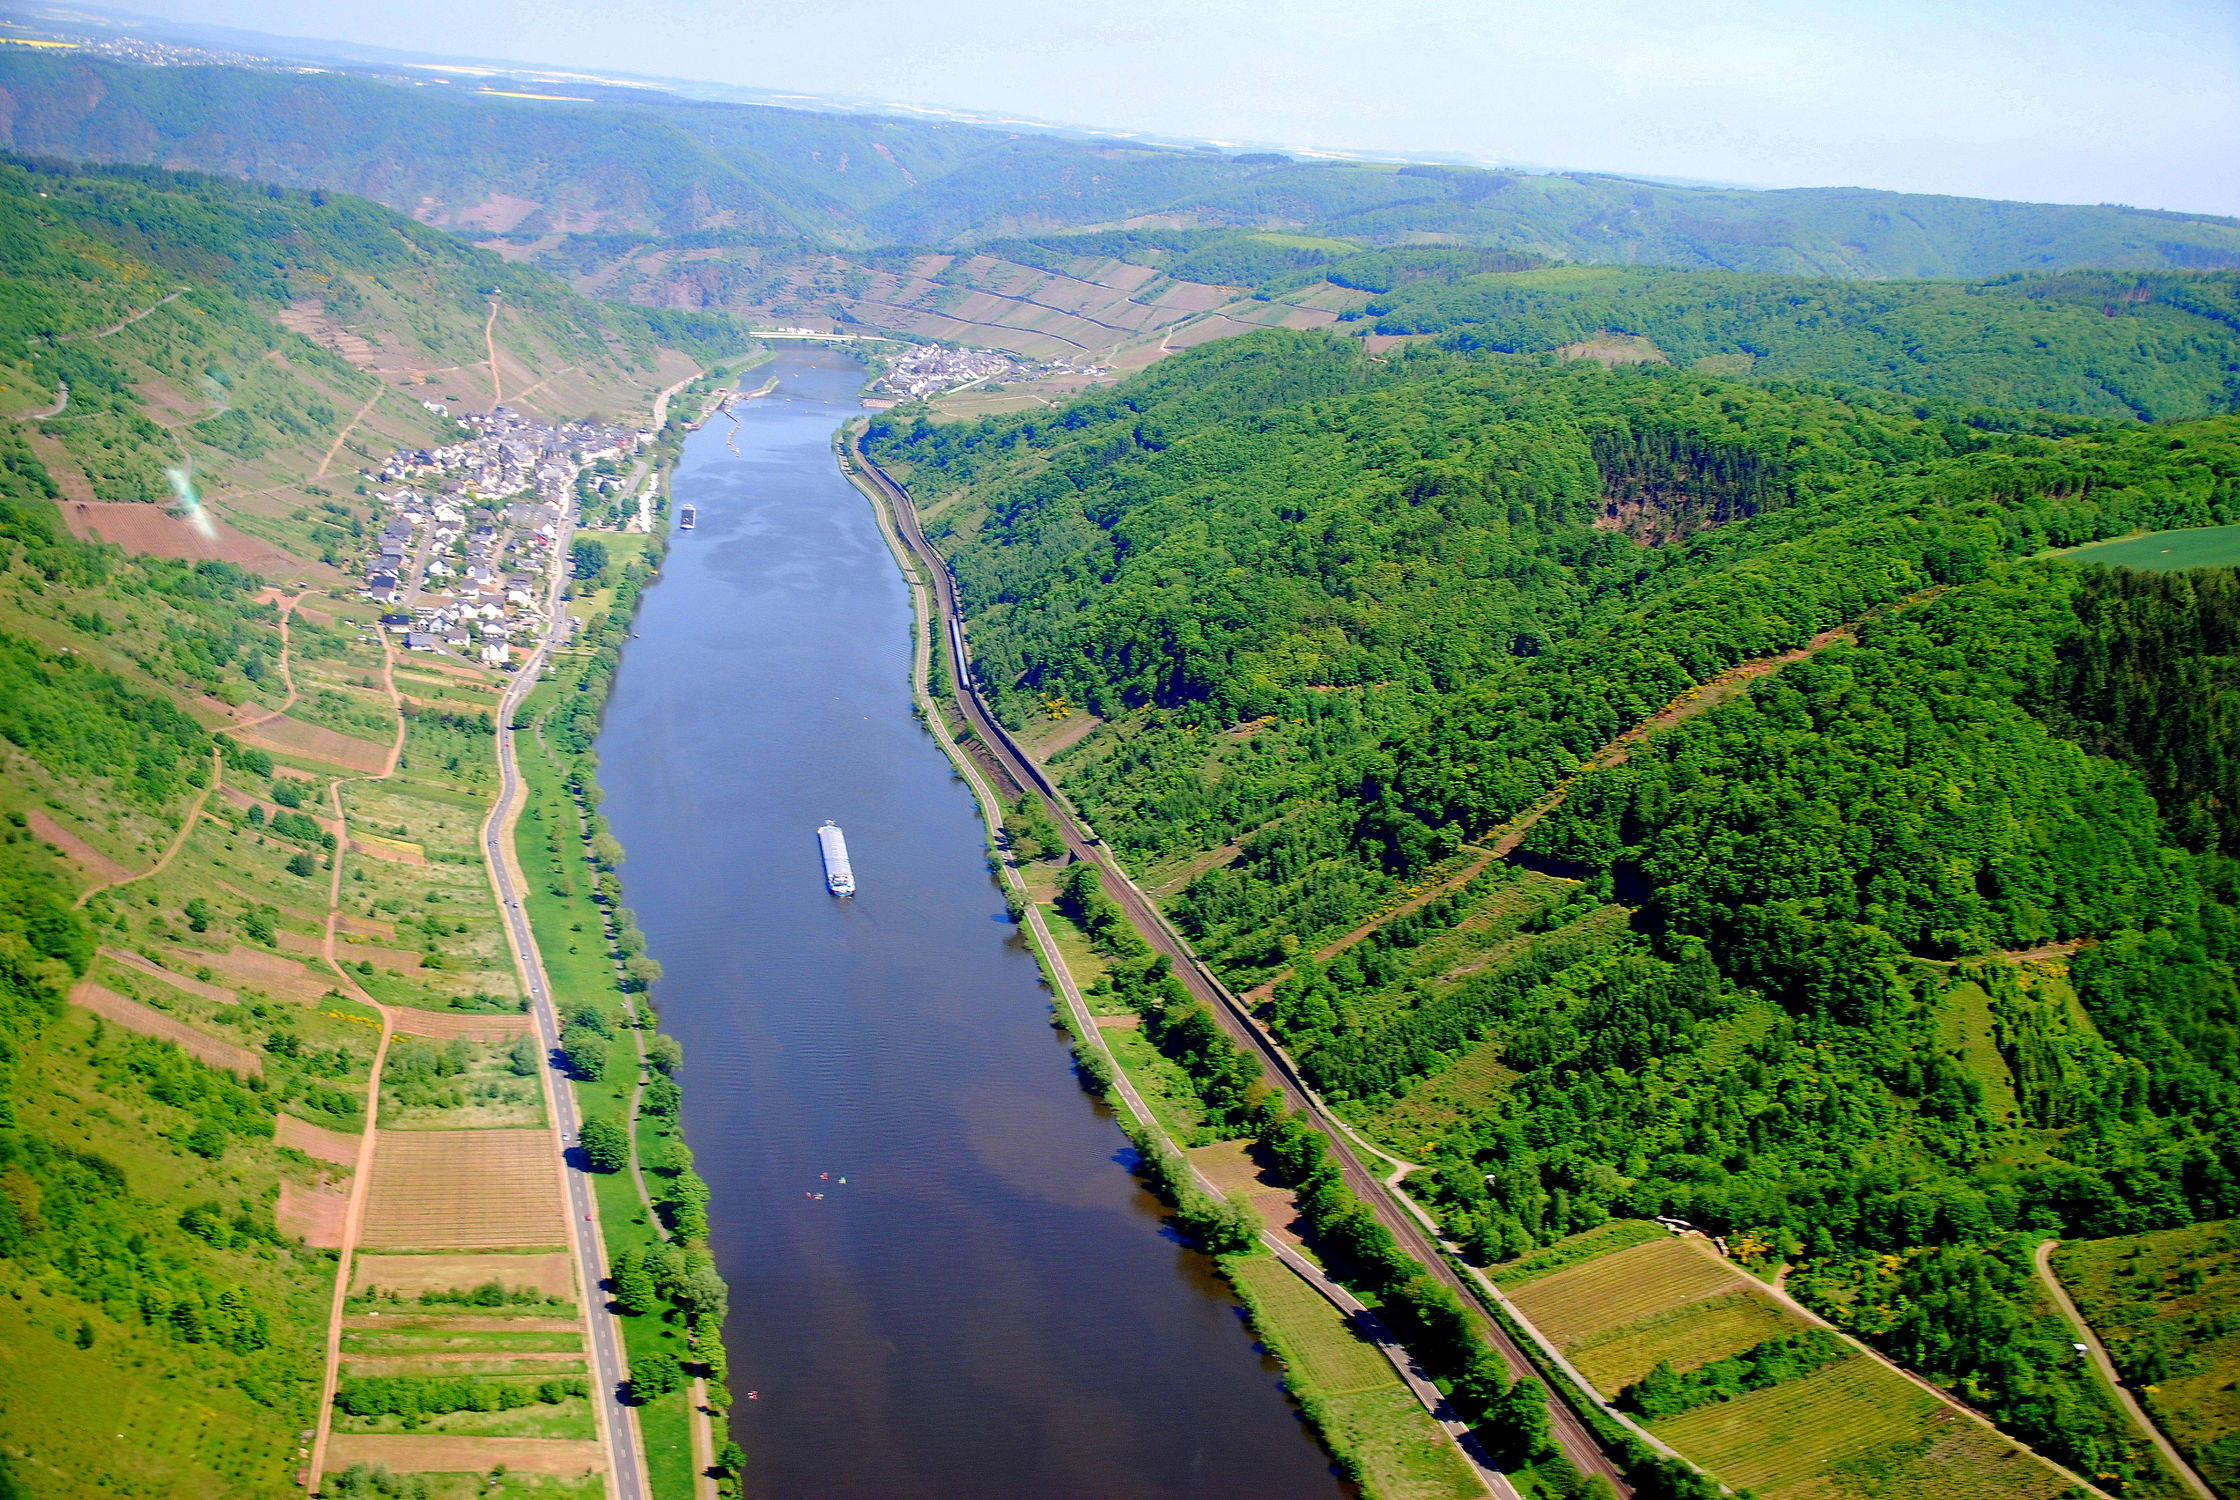 Bild mit Natur, Wasser, Landschaften, Gewässer, Flüsse, Landschaft, Wiese, Feld, Felder, Wiesen, Fluss, Mosel